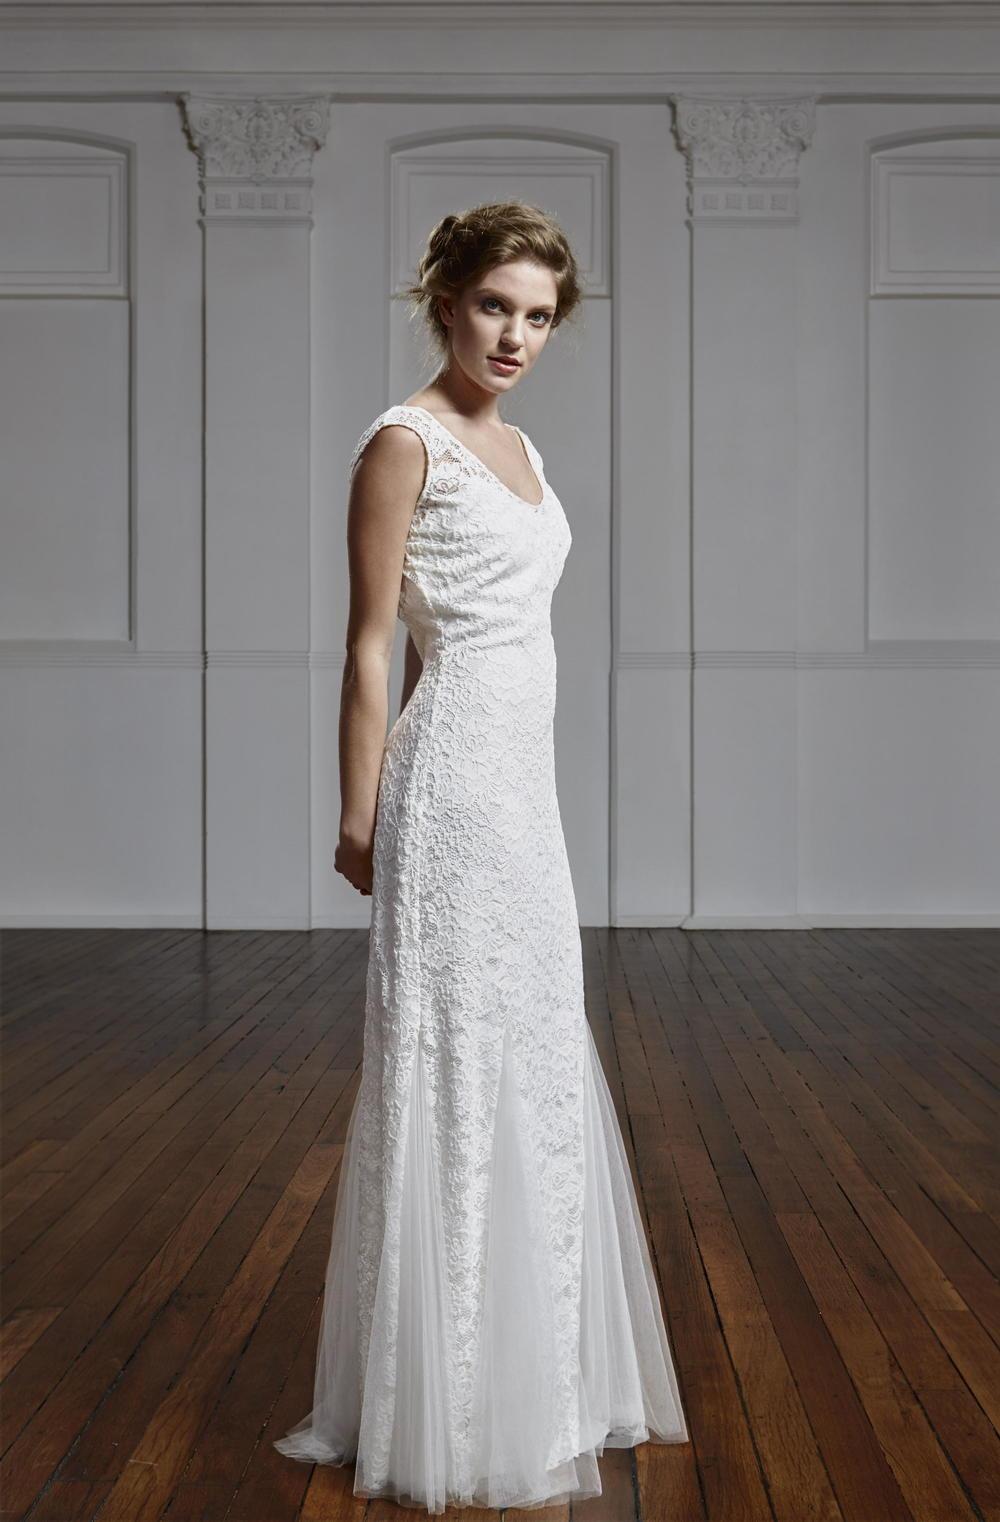 Issy bridal design_TanyaAnic_©GrantSparkesCarroll_193 a.jpg